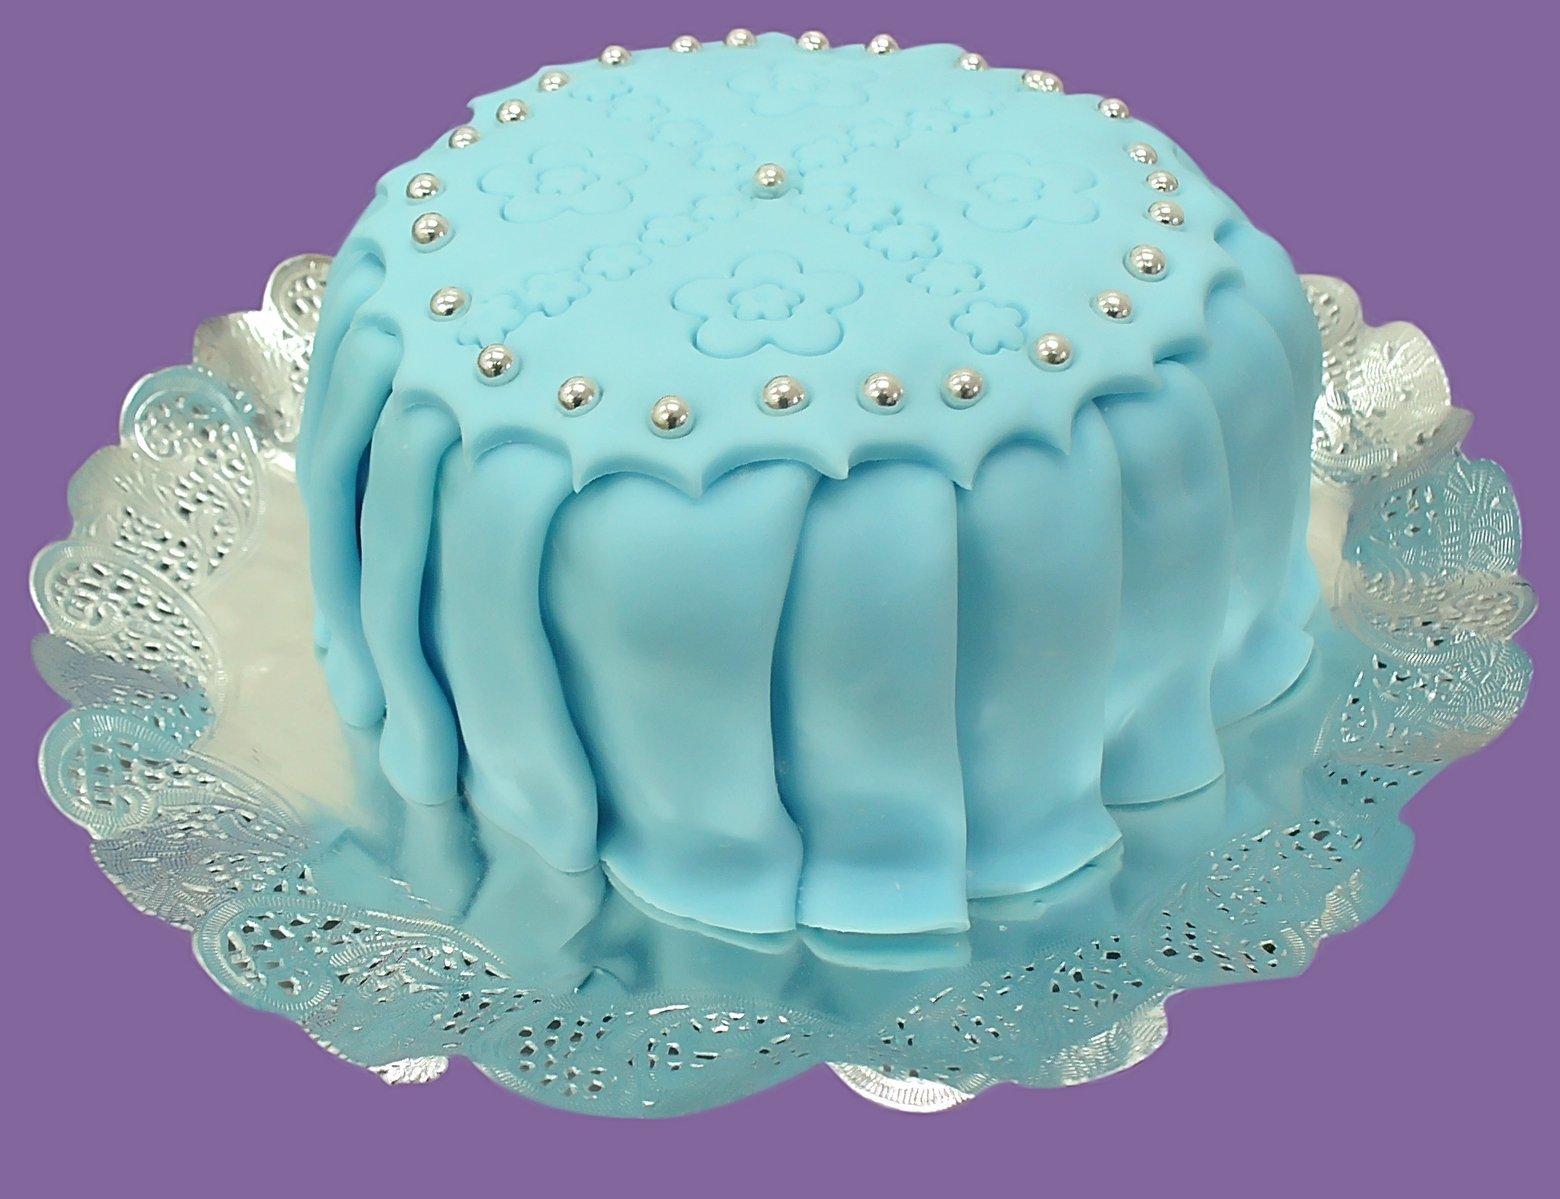 cake-marzipan-1325515.jpg